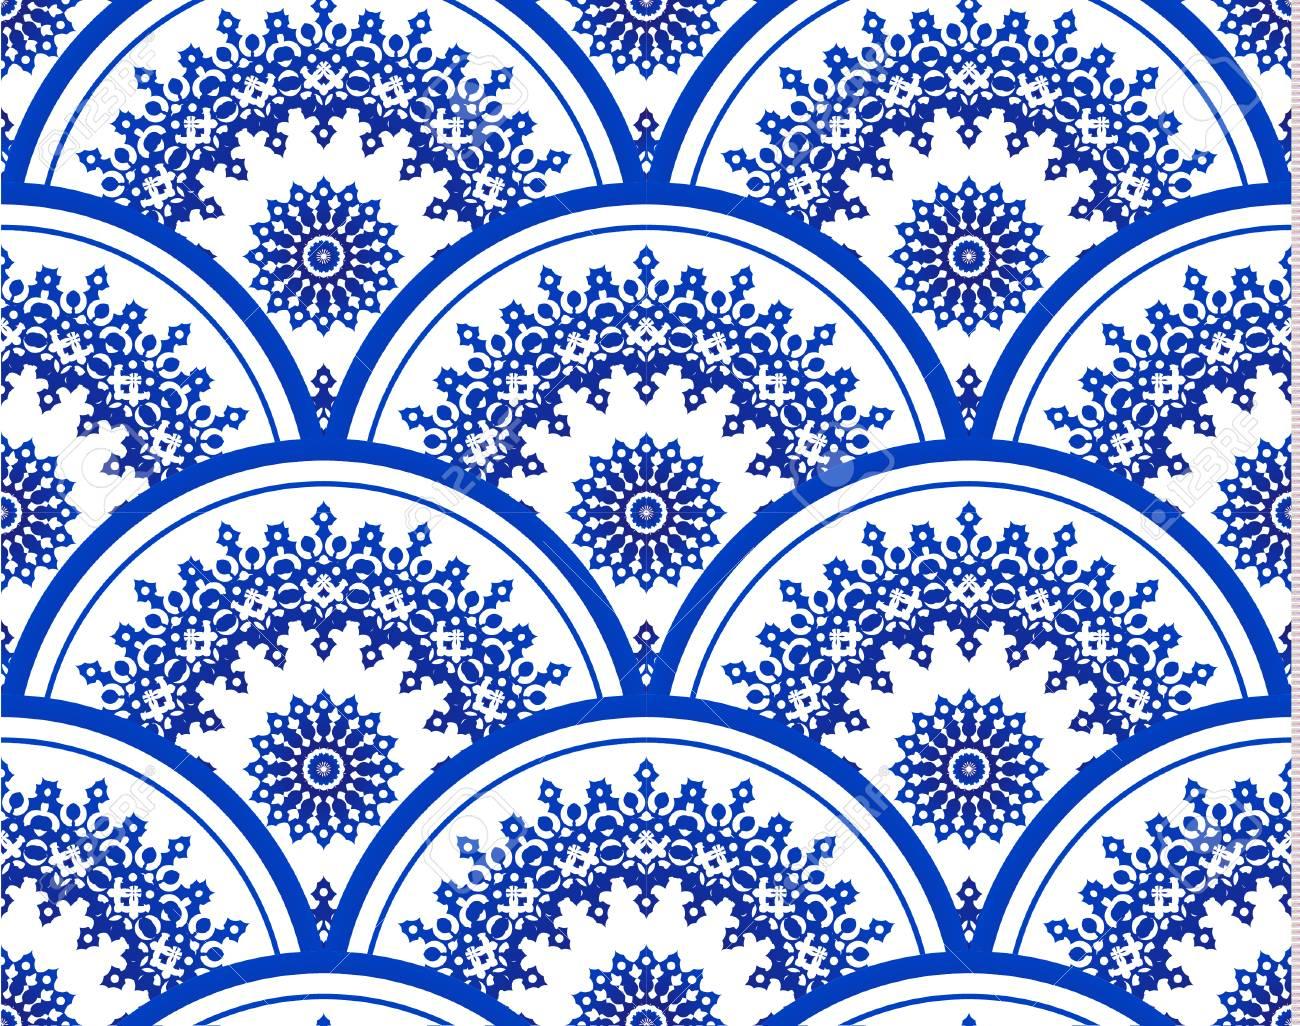 Blue And White Porcelain Seamless Mandala Pattern Background Design Stock Vector